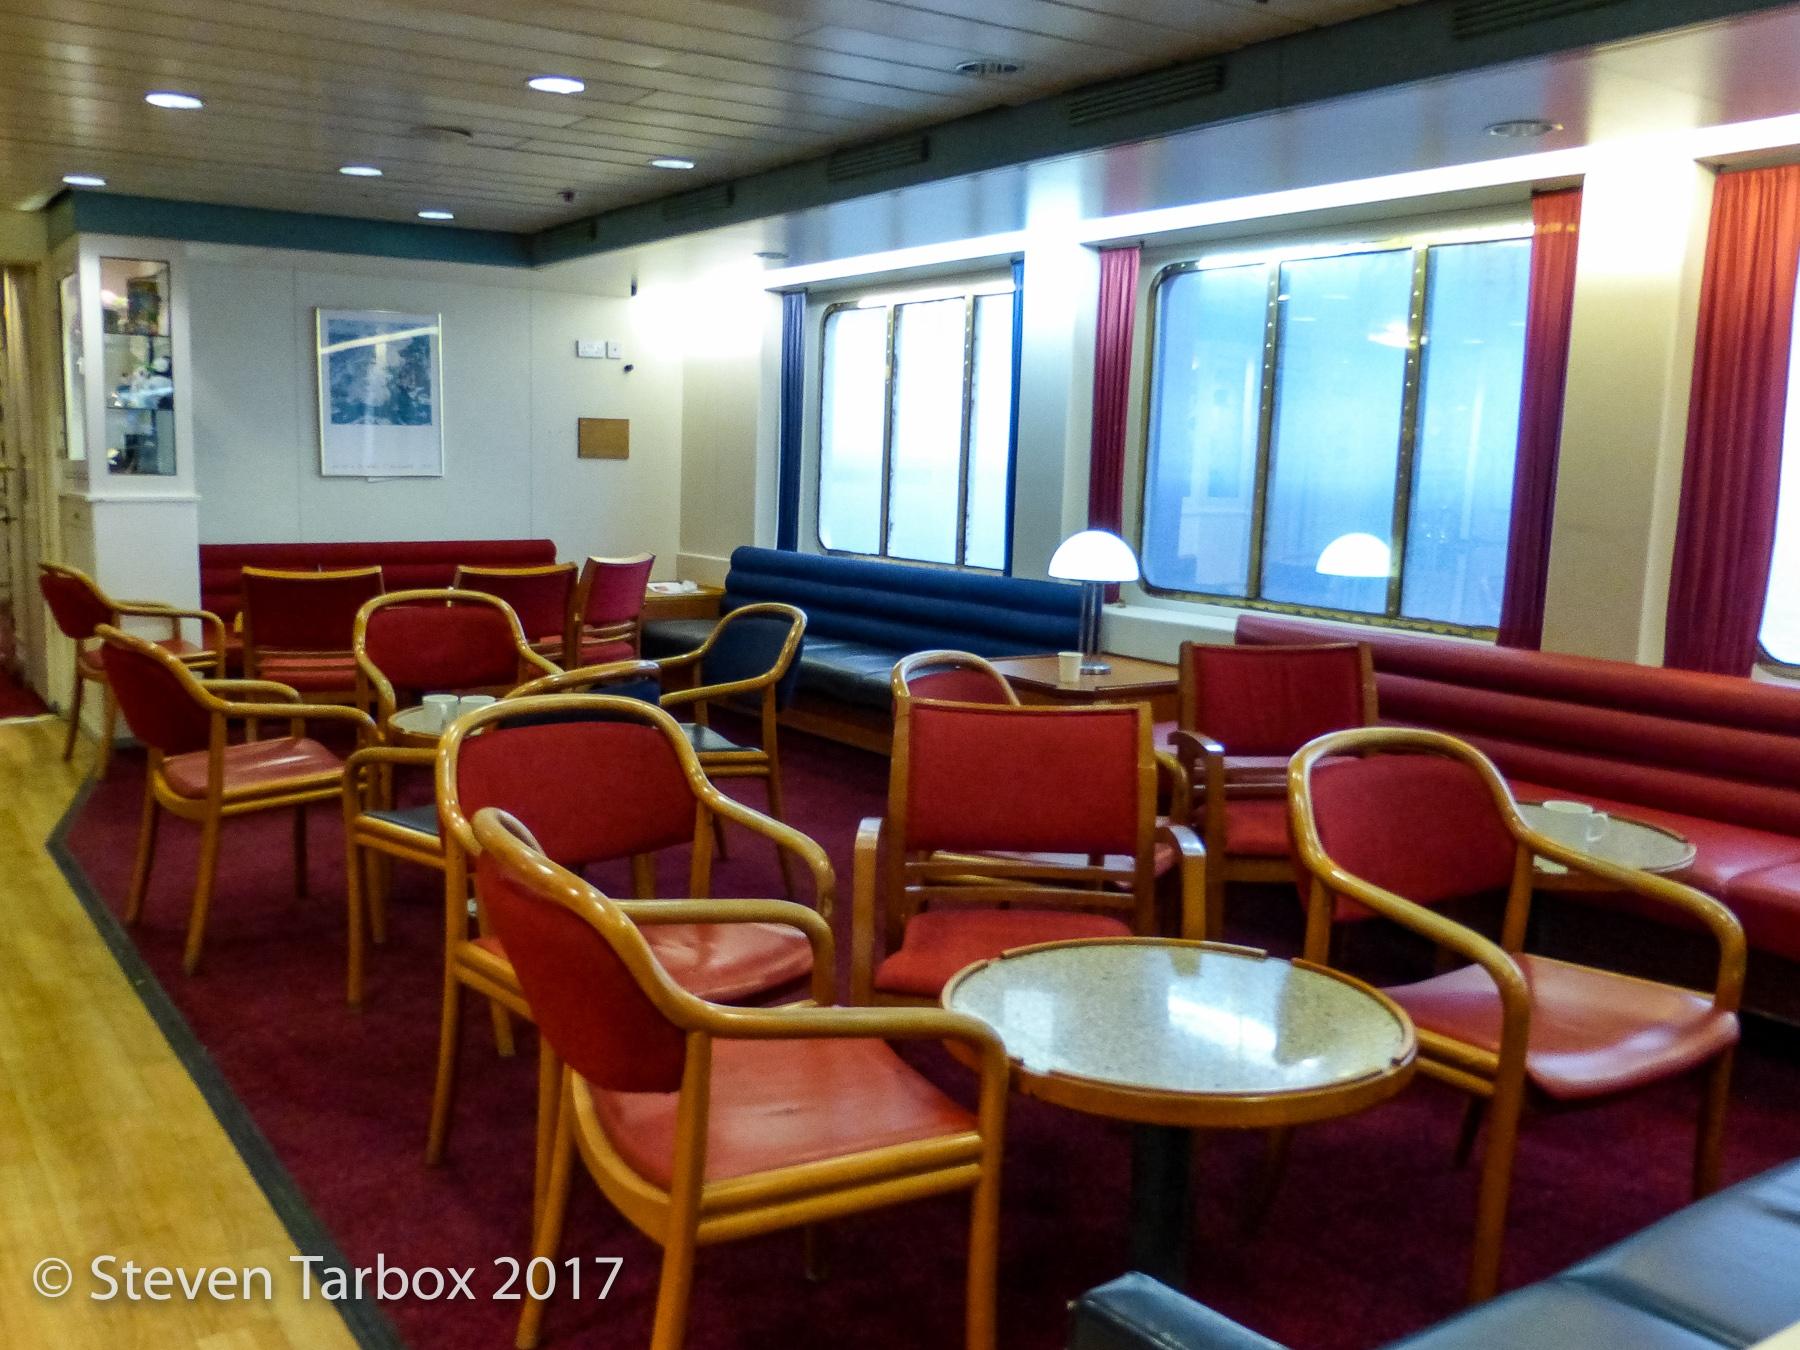 EUROPEAN SEAWAY bar seating area. © Steven Tarbox